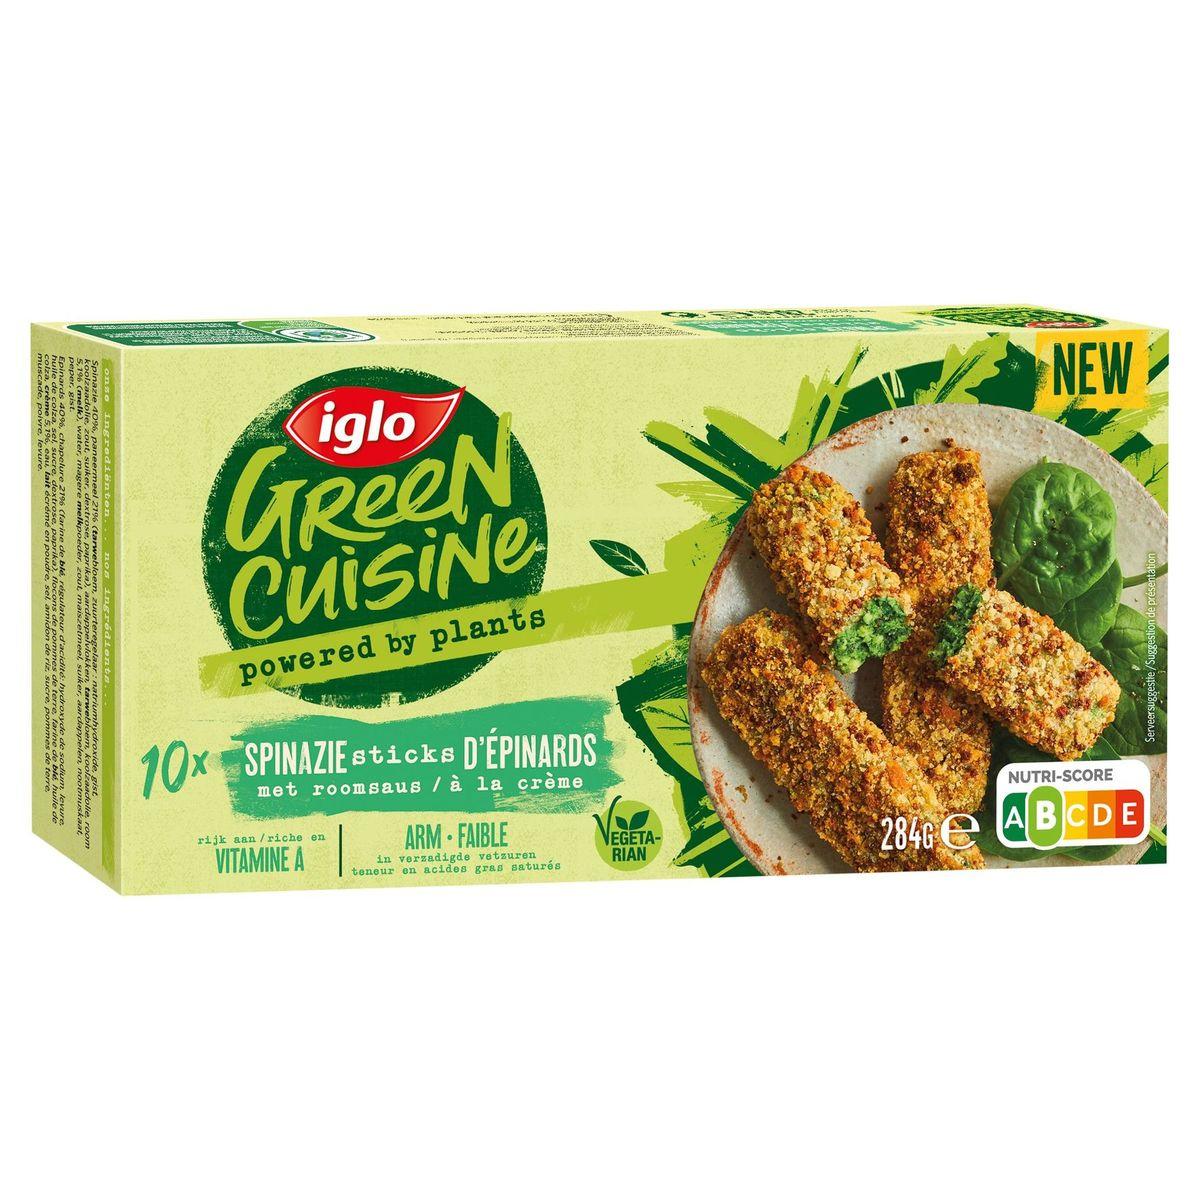 Iglo Green Cuisine spinazie sticks met room 284g